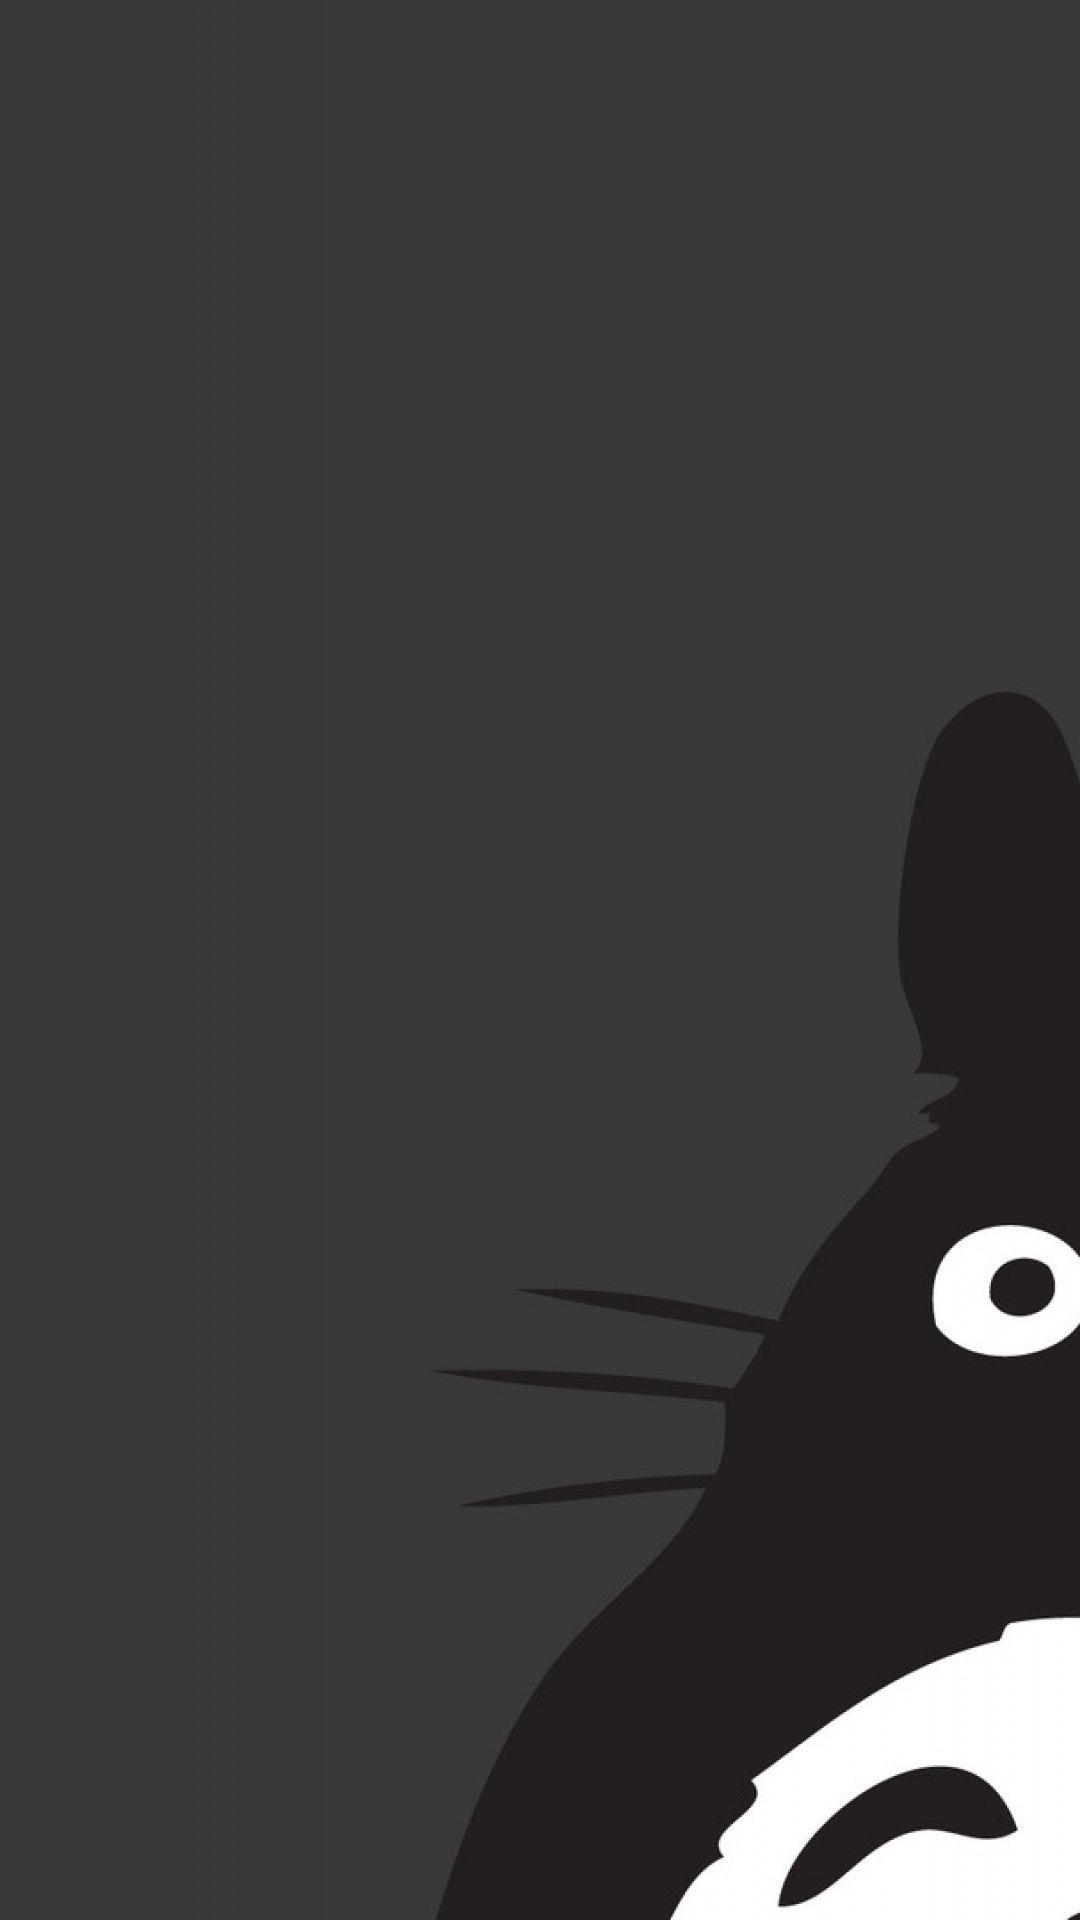 Totoro phone wallpaper background/graphics Pinterest